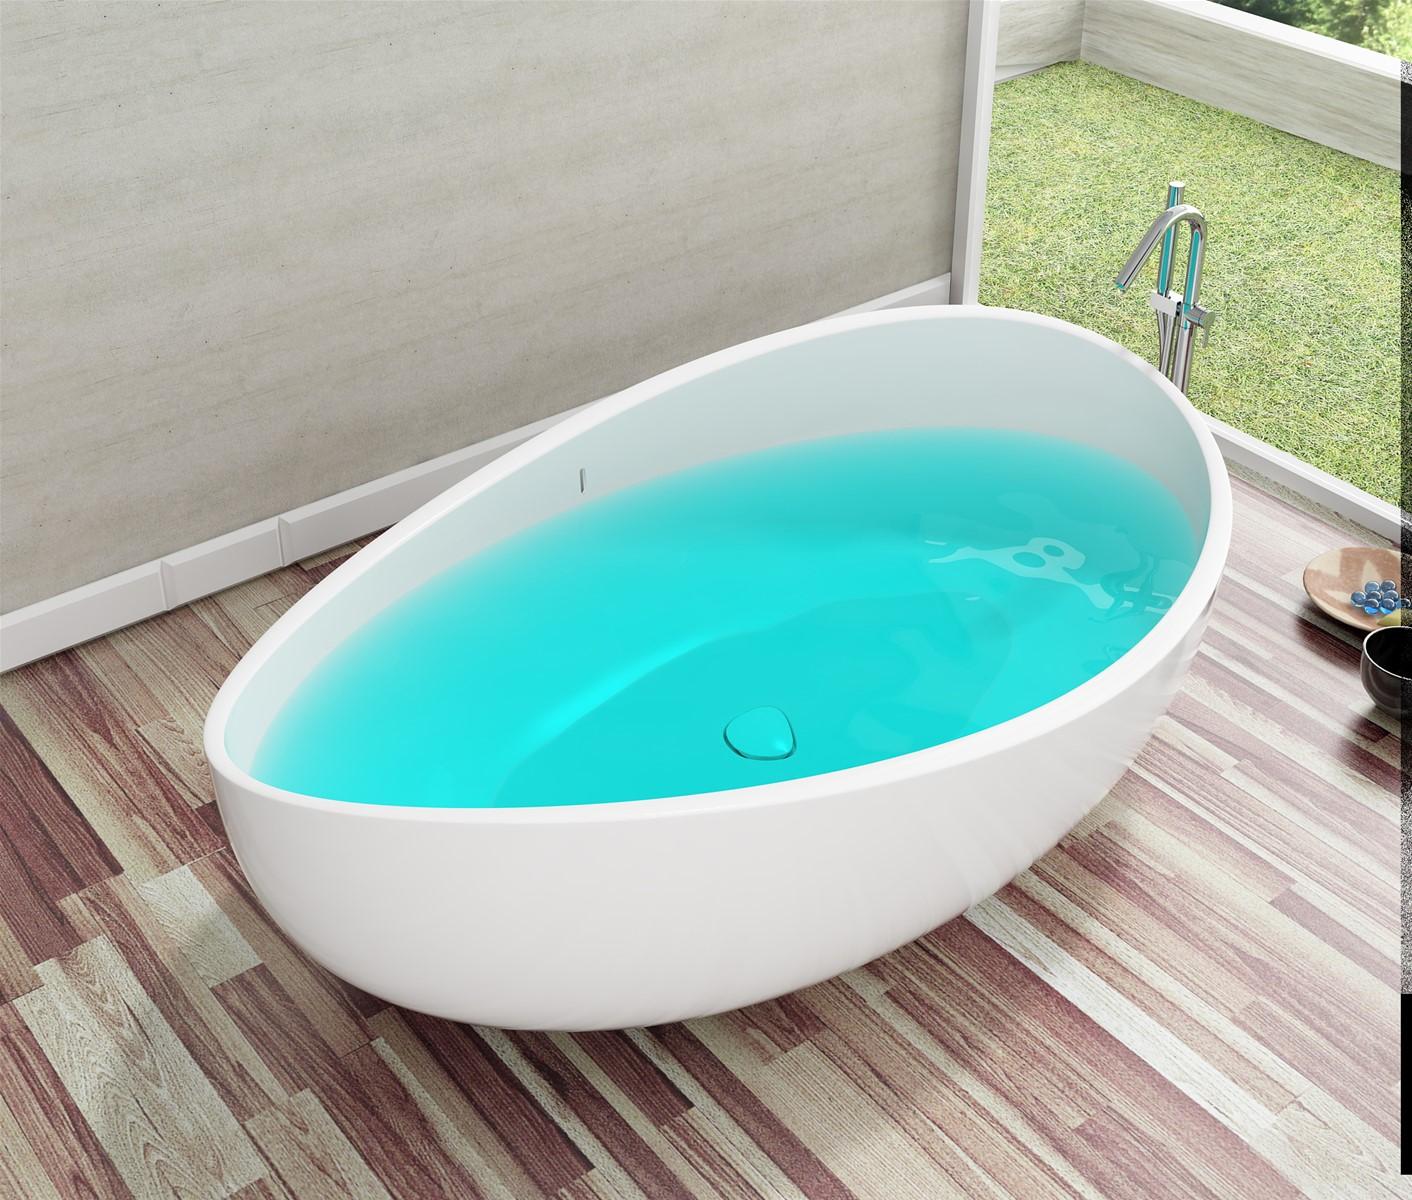 Acrylic Freestanding Bathtub (Onda) Factory & Manufacture purchasing ...